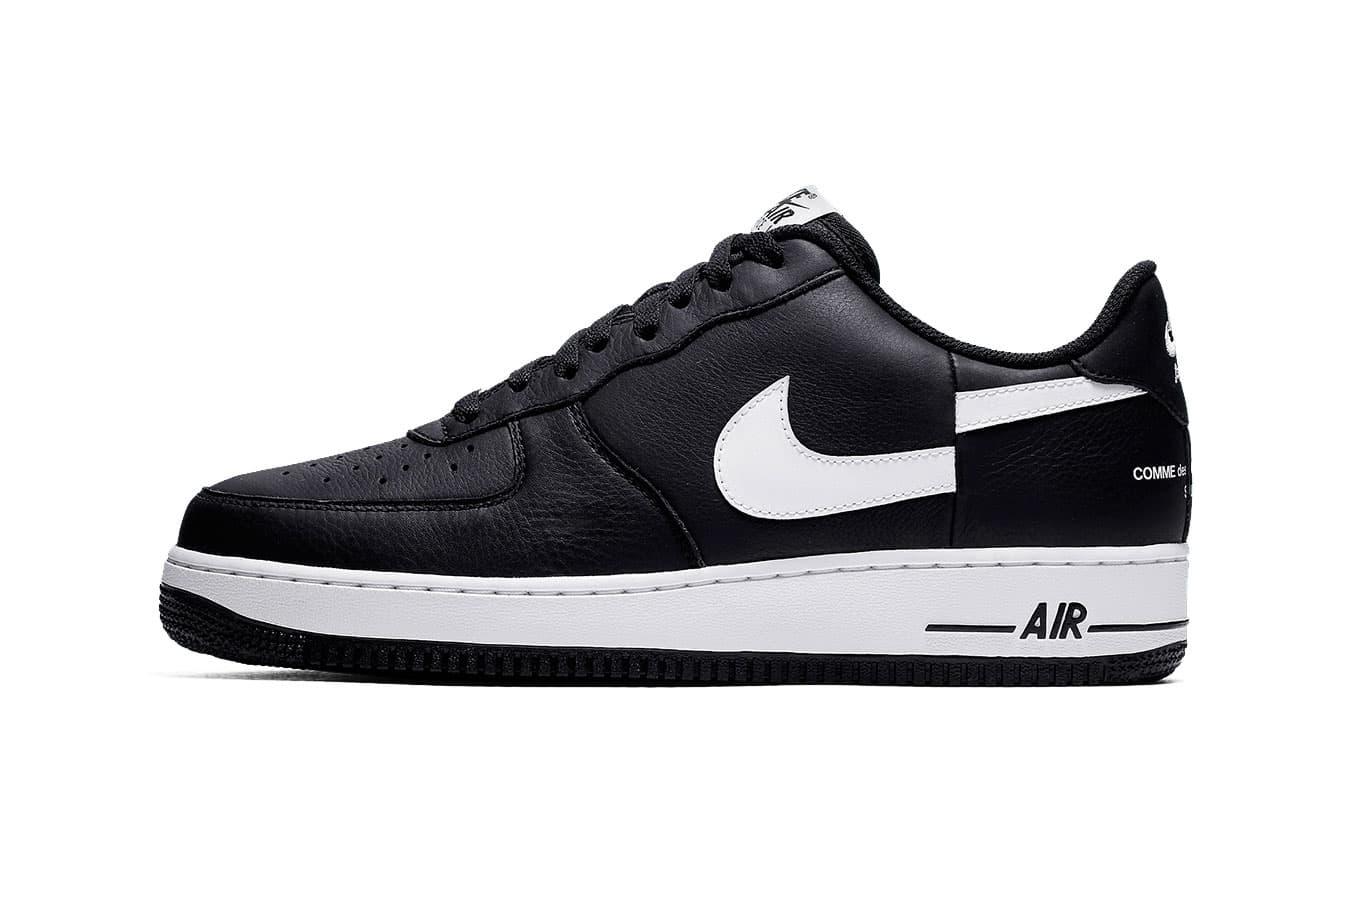 Supreme CdG Nike Air Force 1 Split Swoosh Release Date black white Info COMME des GARÇONS Shirt pricing details sneaker black white